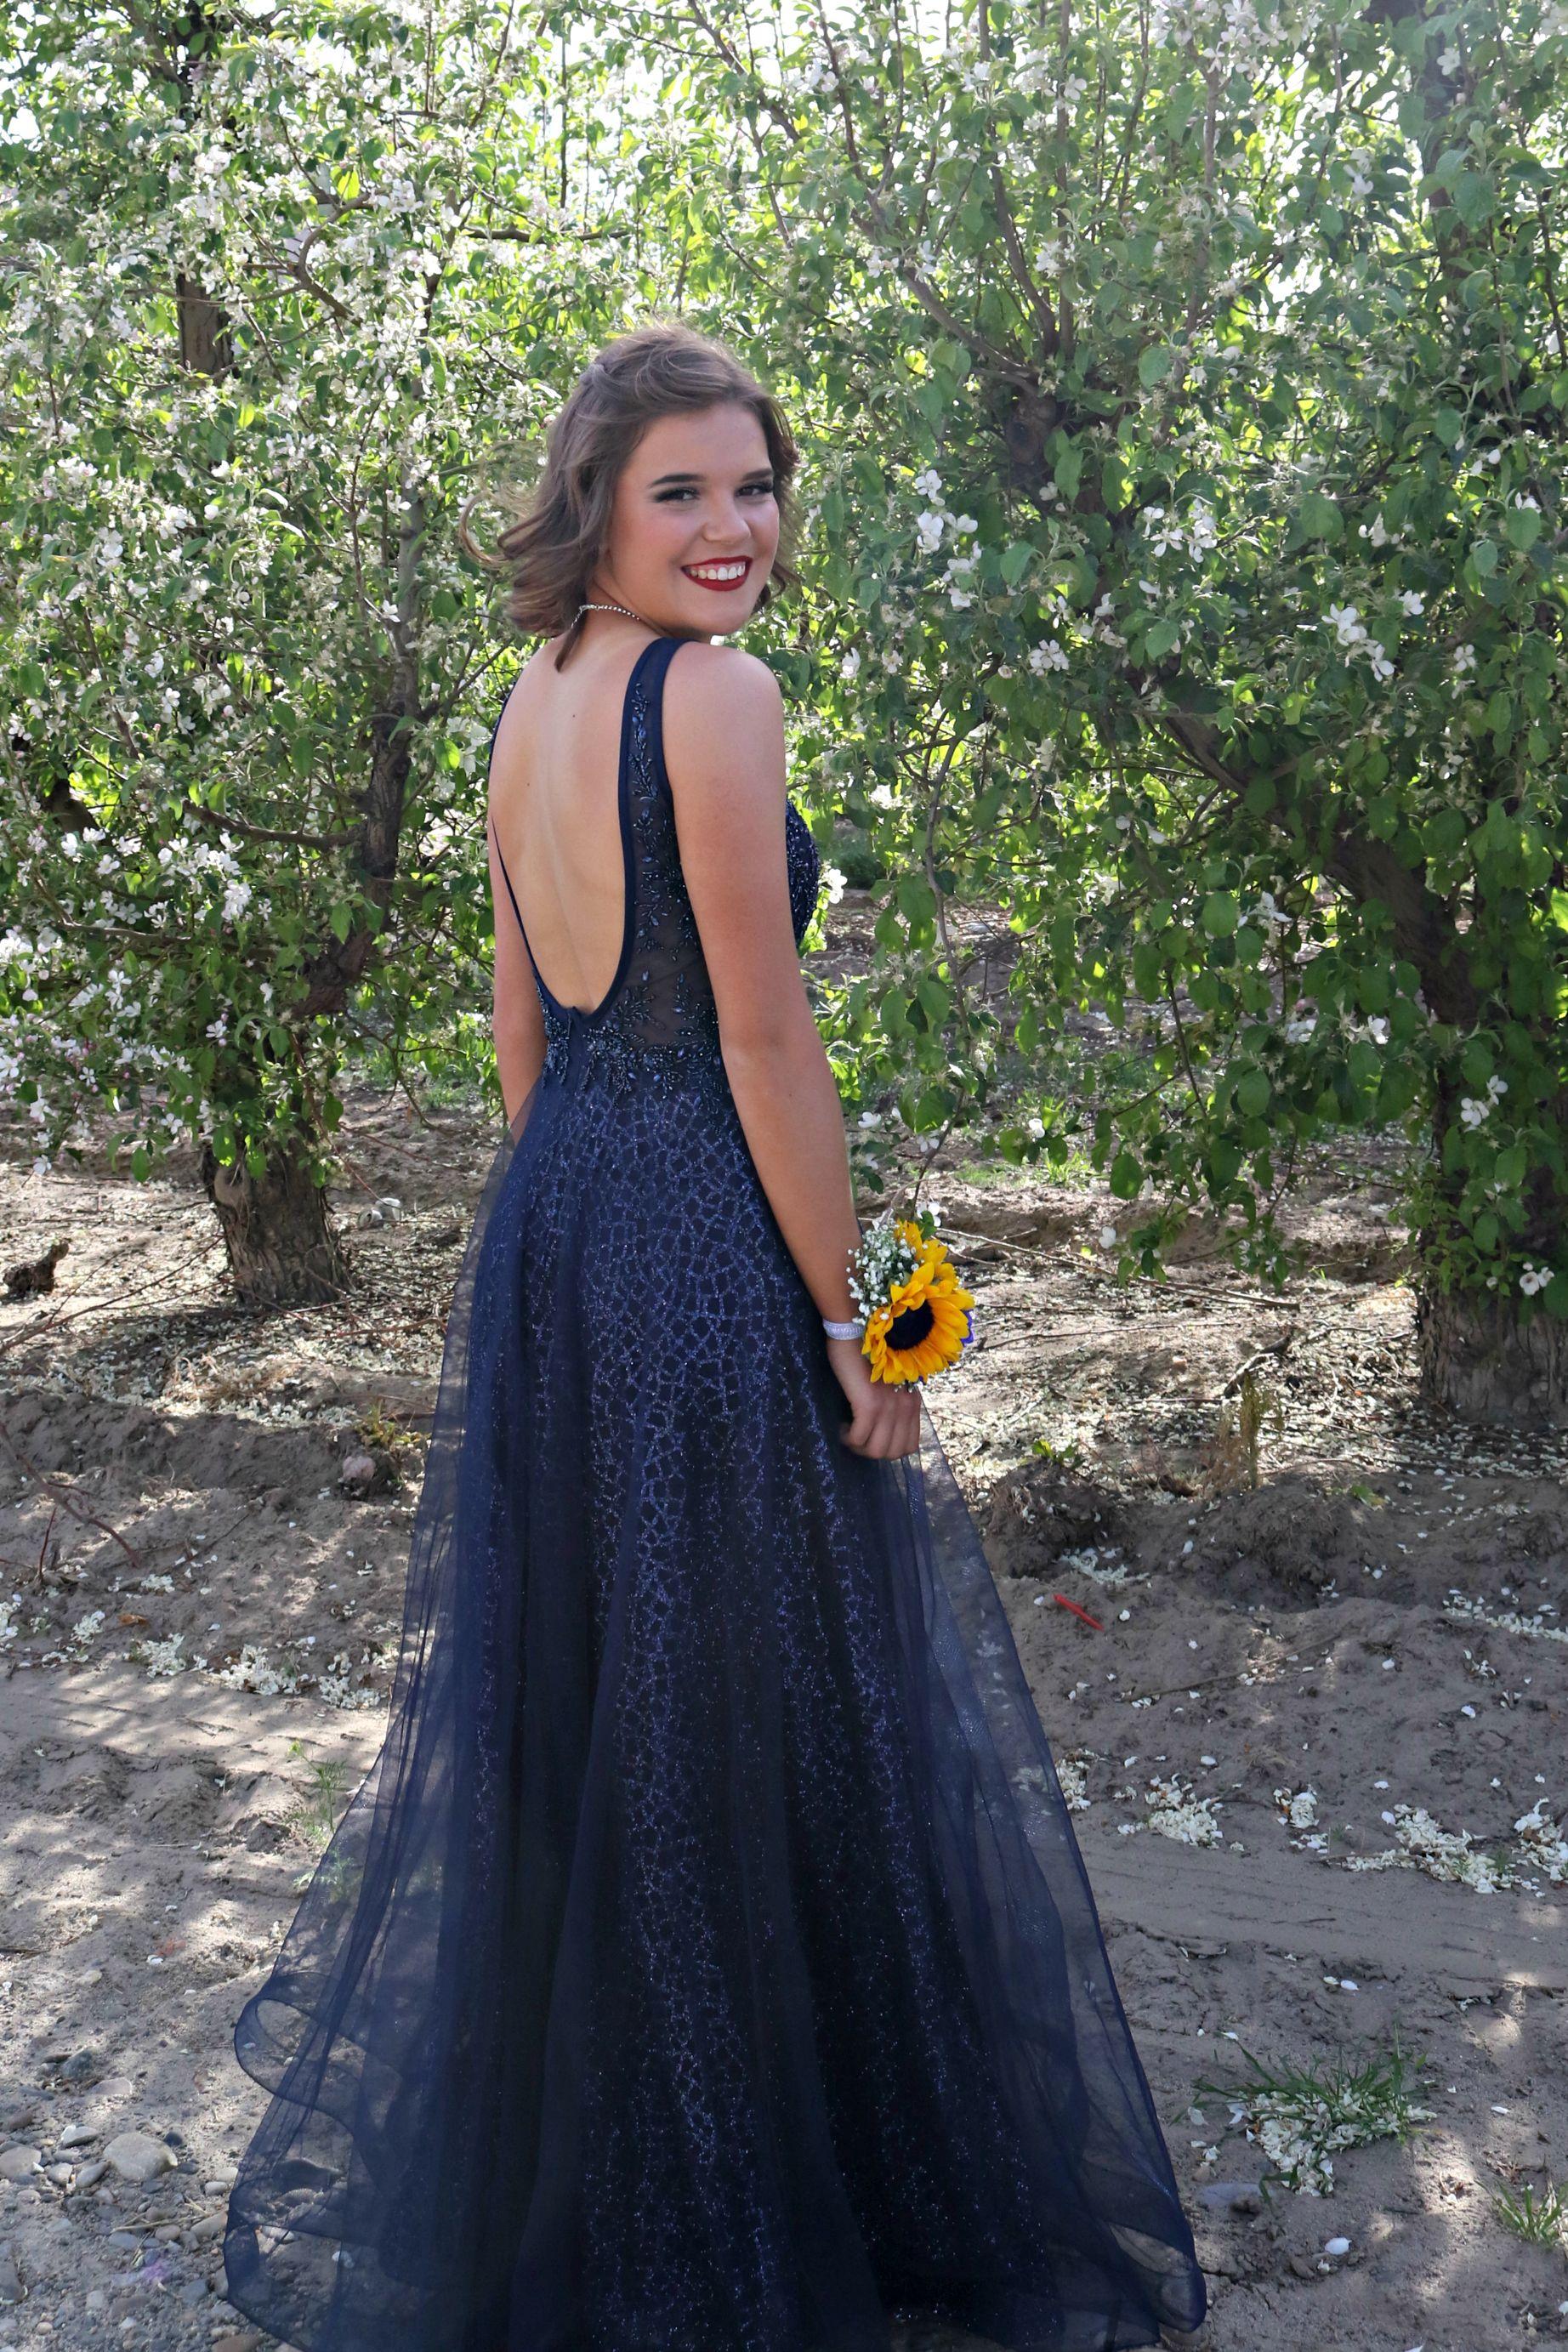 Sunflower Prom Backless Dress Formal Prom High School Prom [ 2766 x 1844 Pixel ]